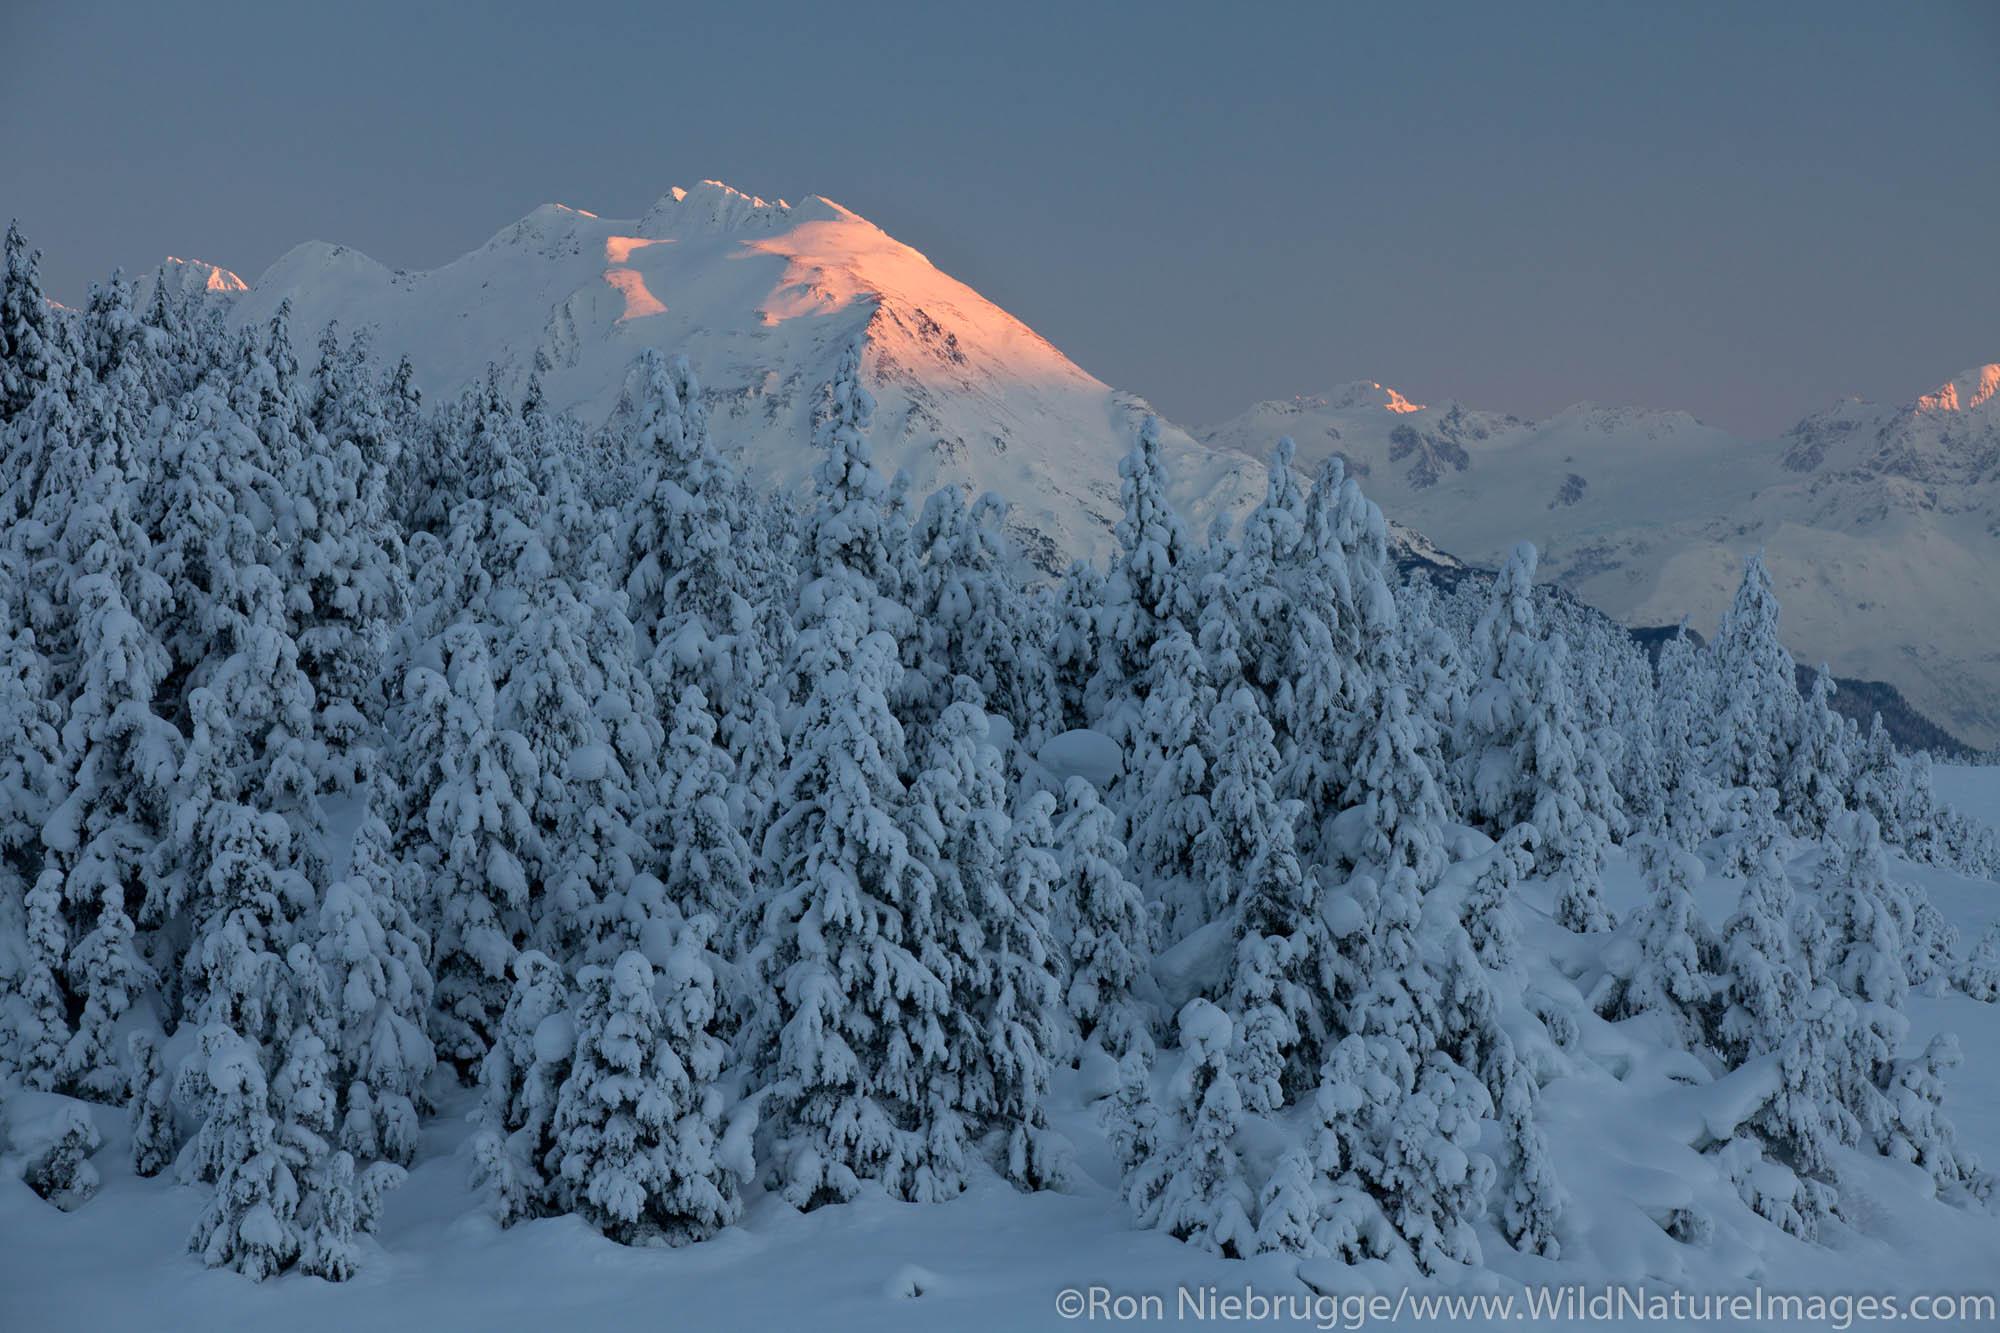 Snow trees in Turnagain Pass, Chugach National Forest, Alaska.